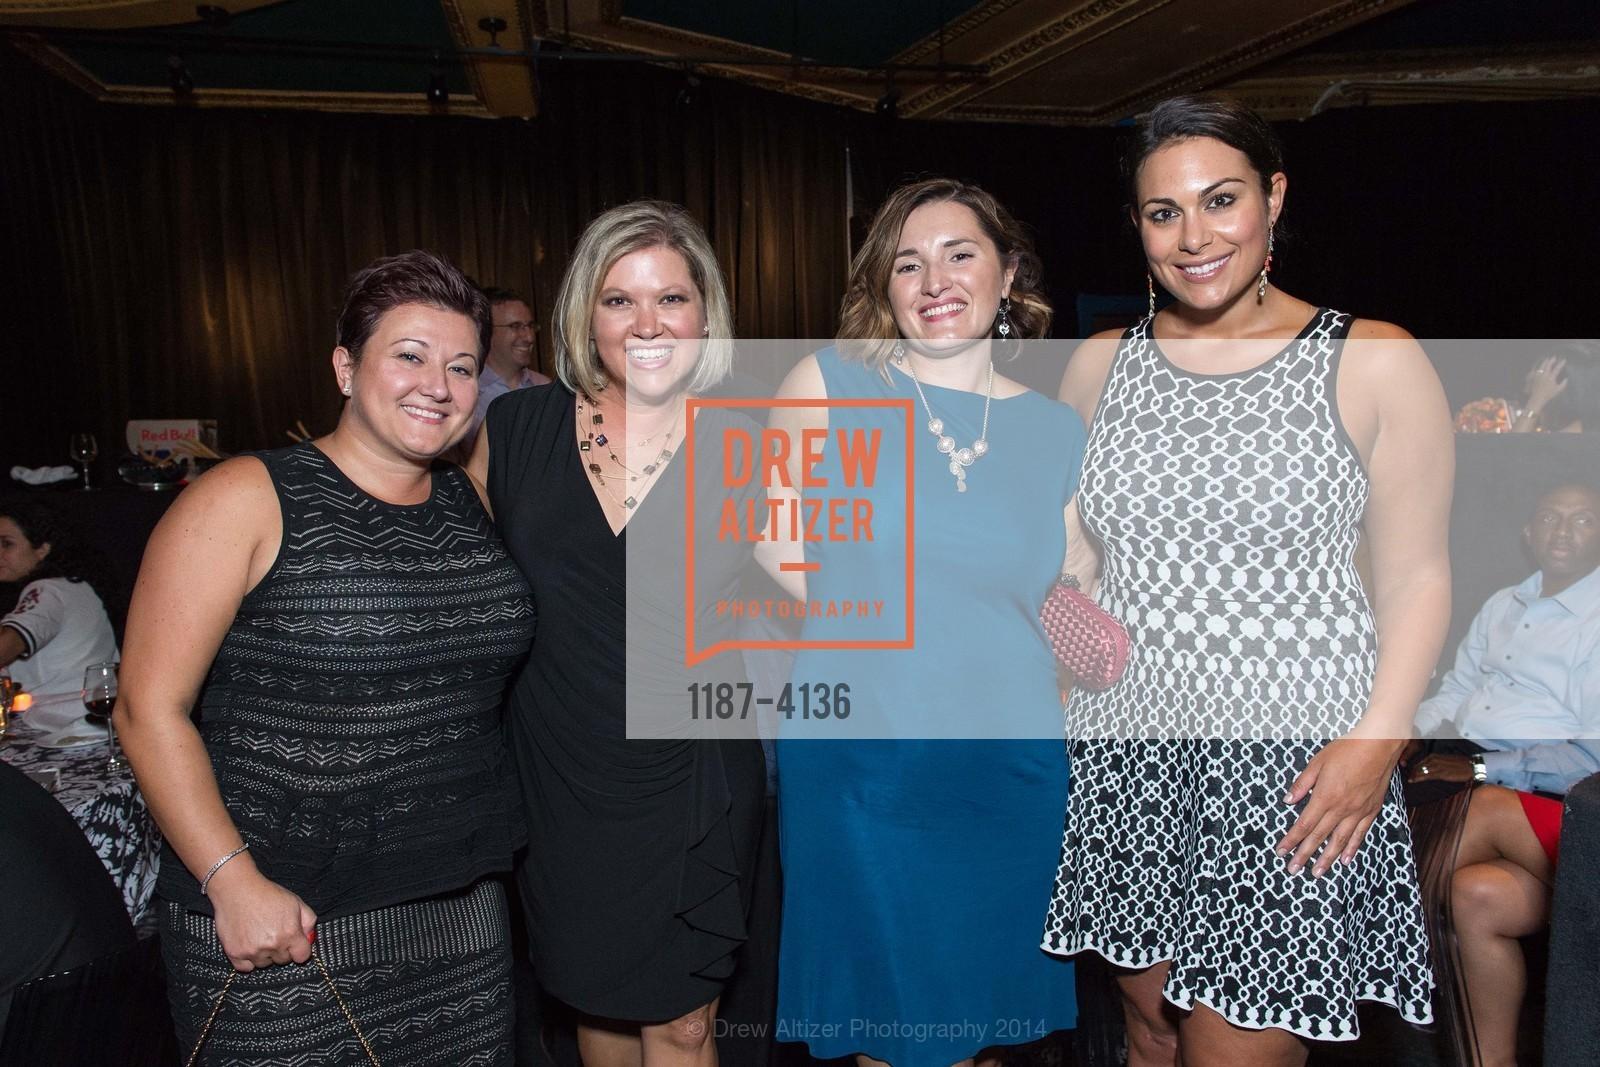 Jenny Bernstein, Belma Borovac, Libby Leffler, Photo #1187-4136